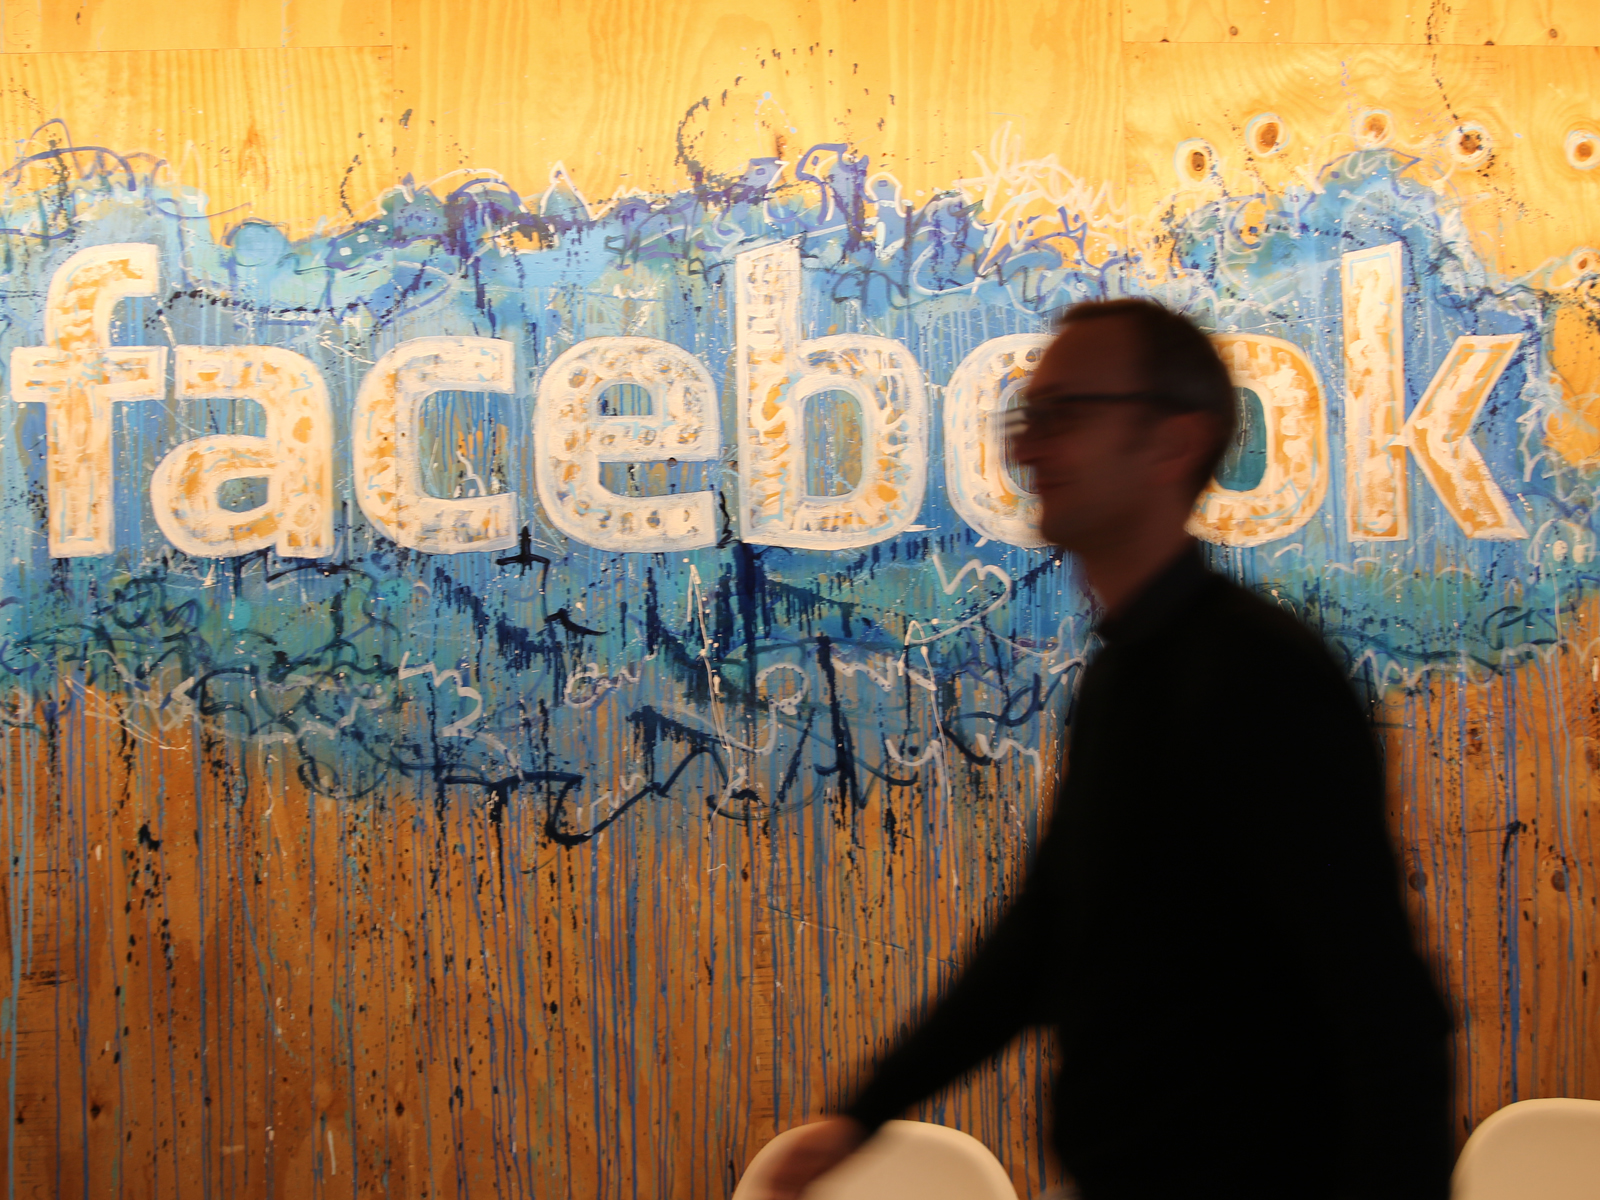 1411618401-facebook-logo-bei-facebook-international.jpg